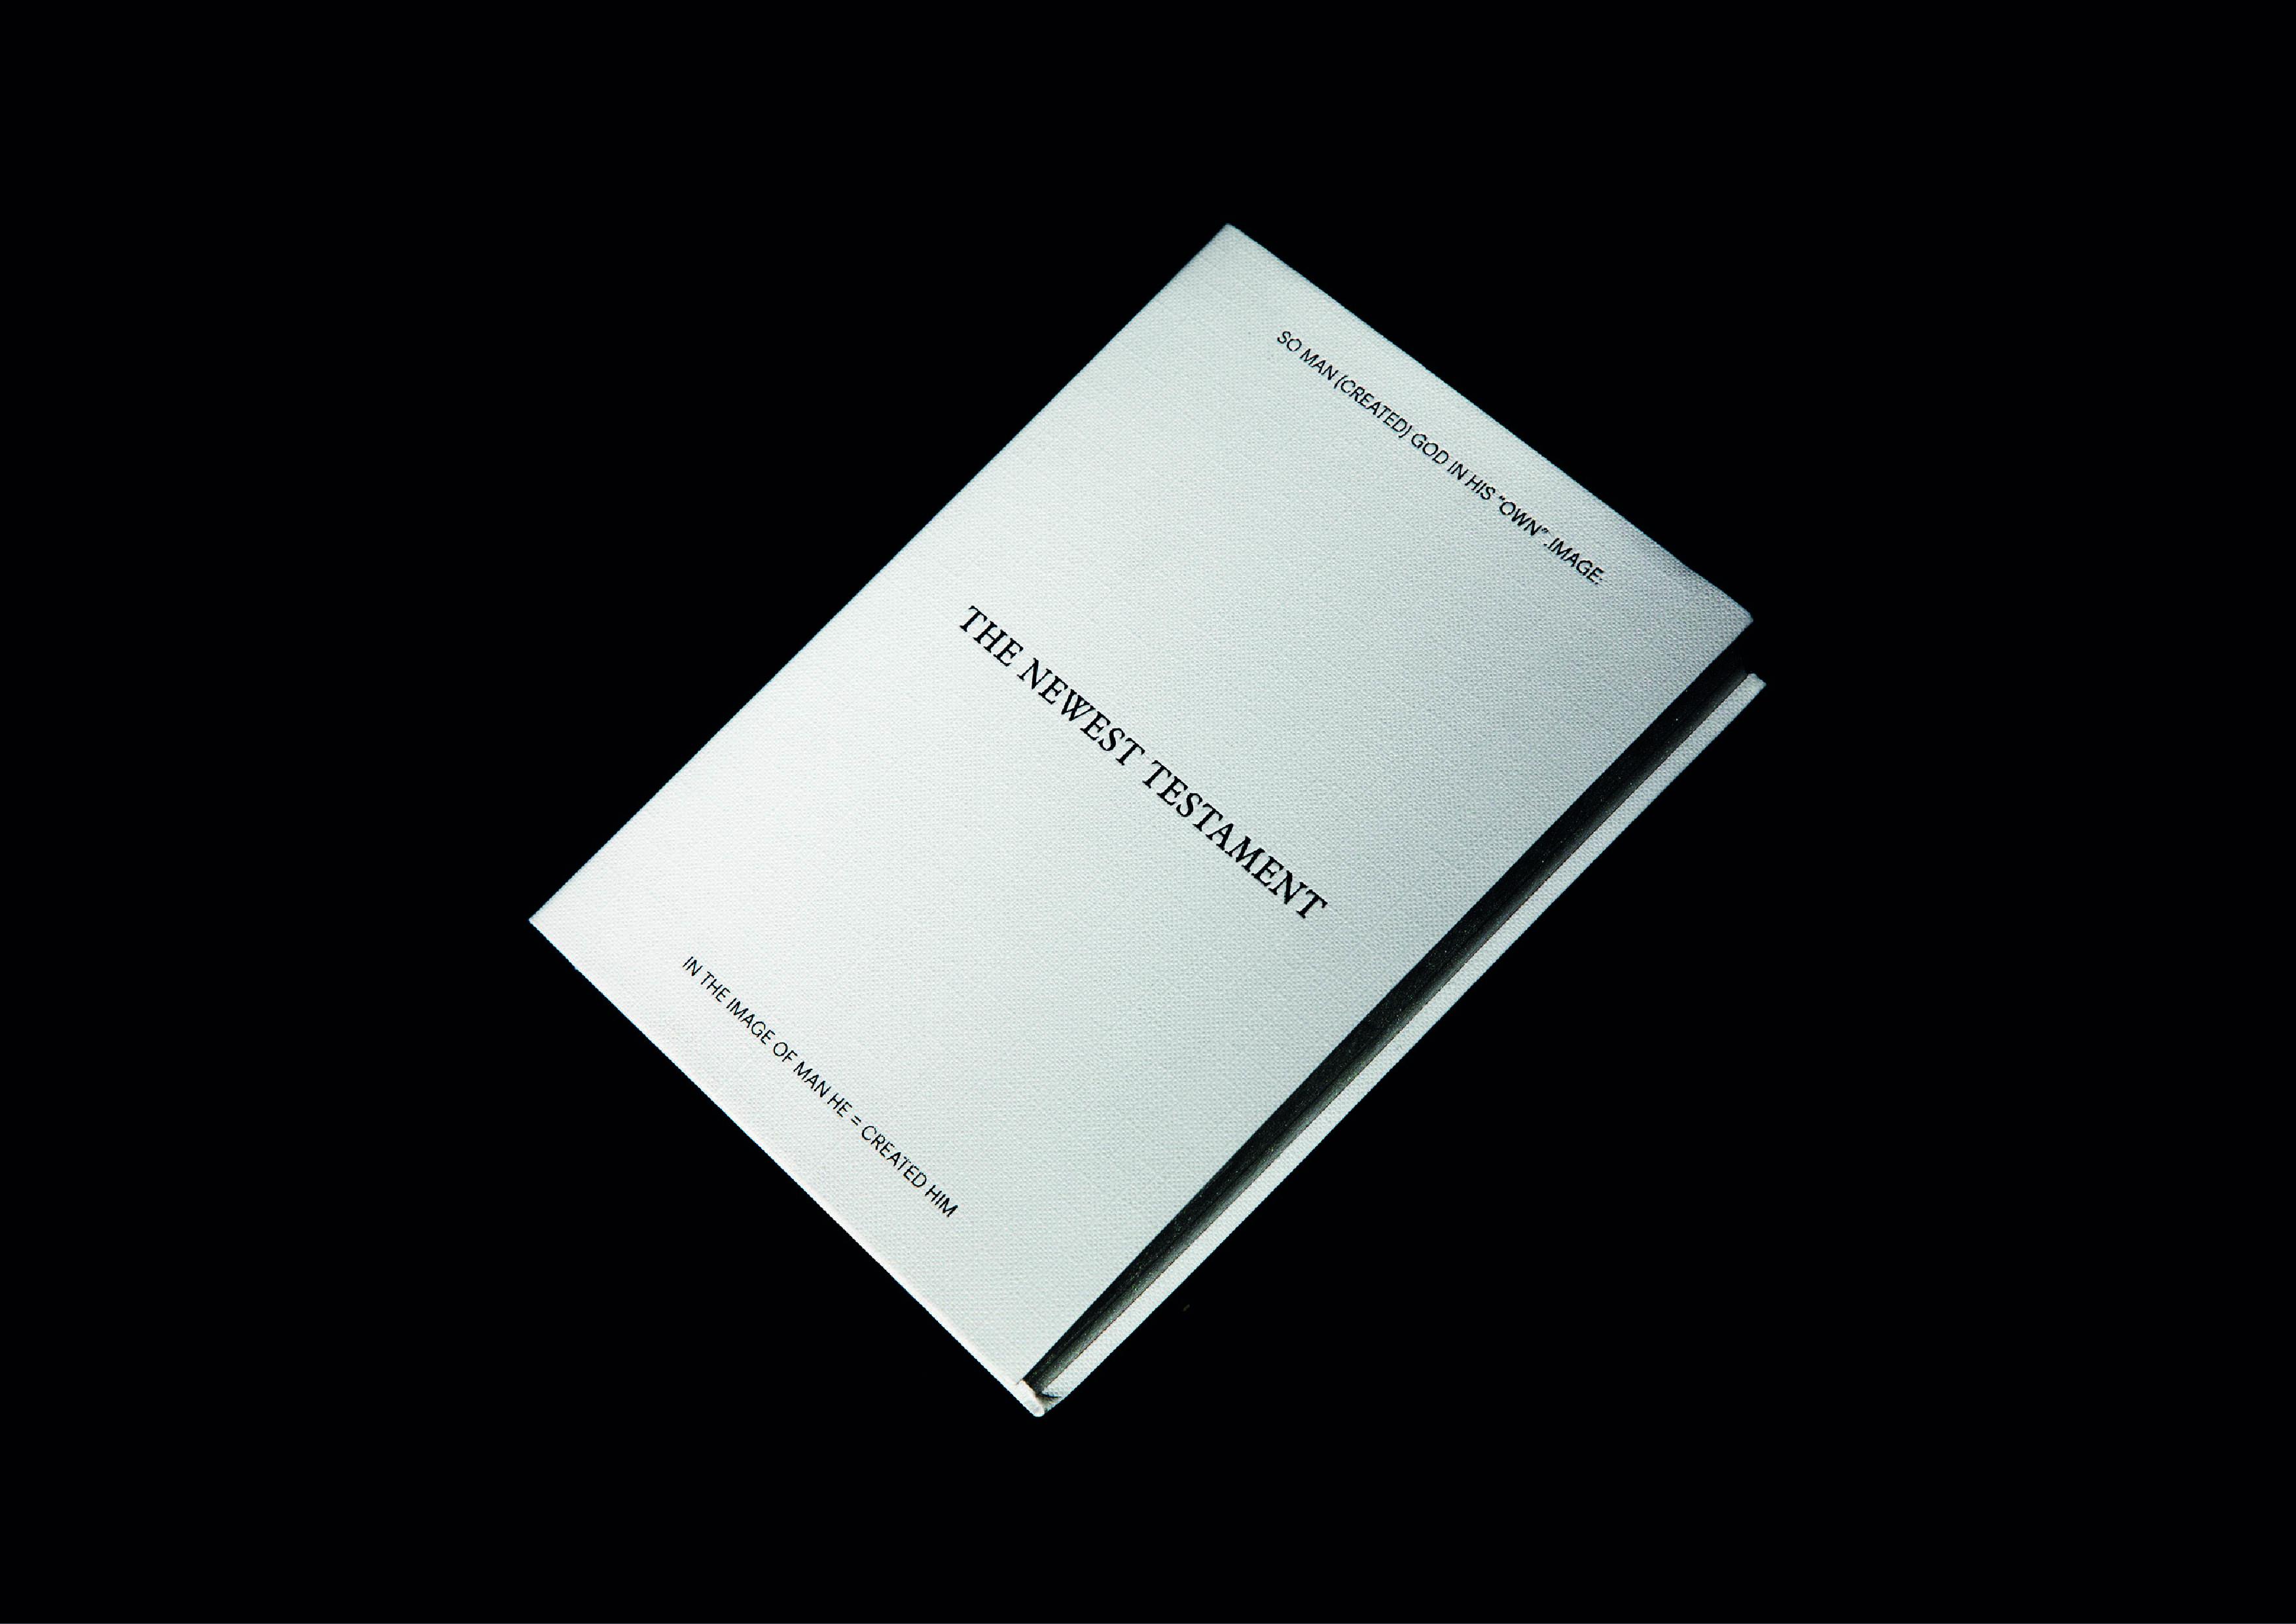 The Newest Testament by Olga Pipnik, Daniel Senior - Creative Work